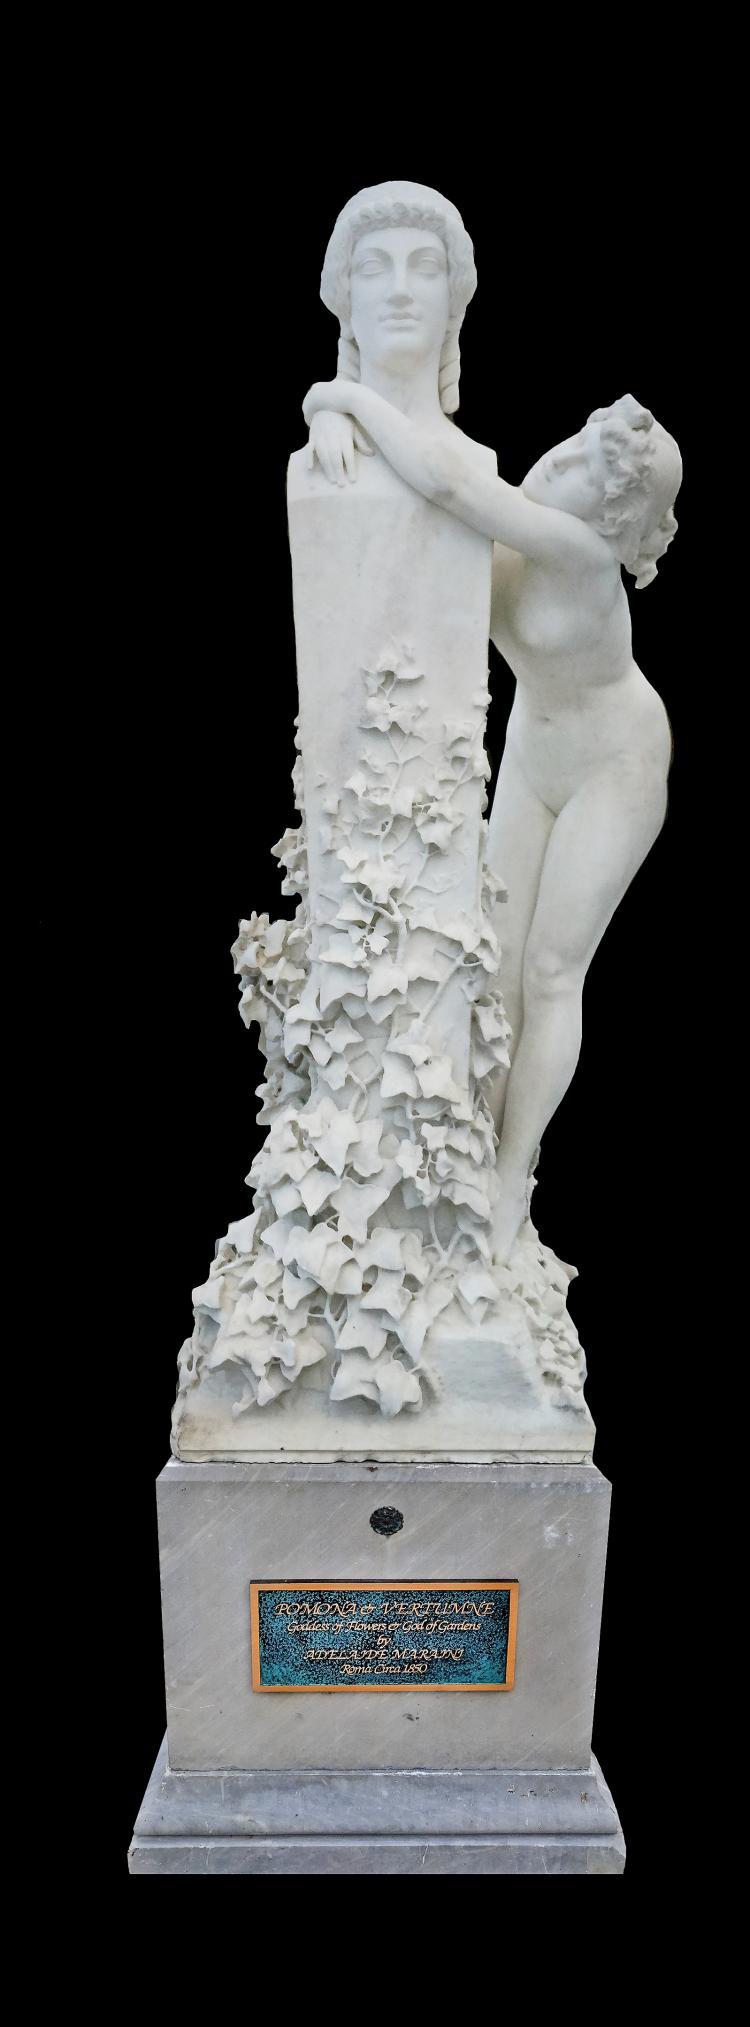 ADELAIDE MARAINI, ITALIAN MARBLE OF POMONA & HERM